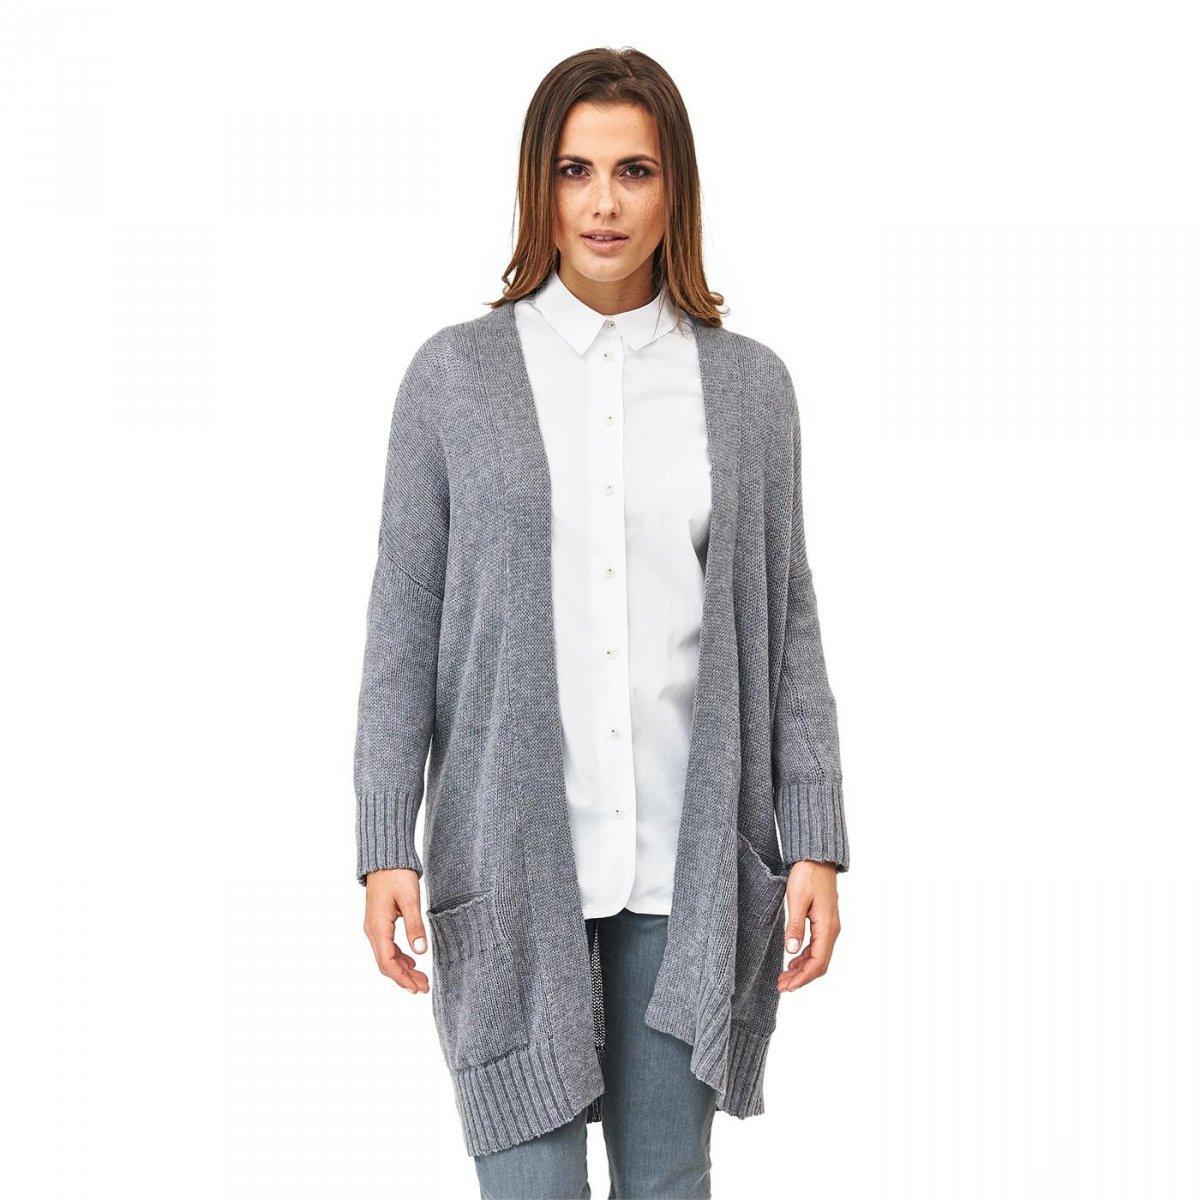 4a94fe755f69 Cardigan lungo donna in lana merino biologica - Living Crafts